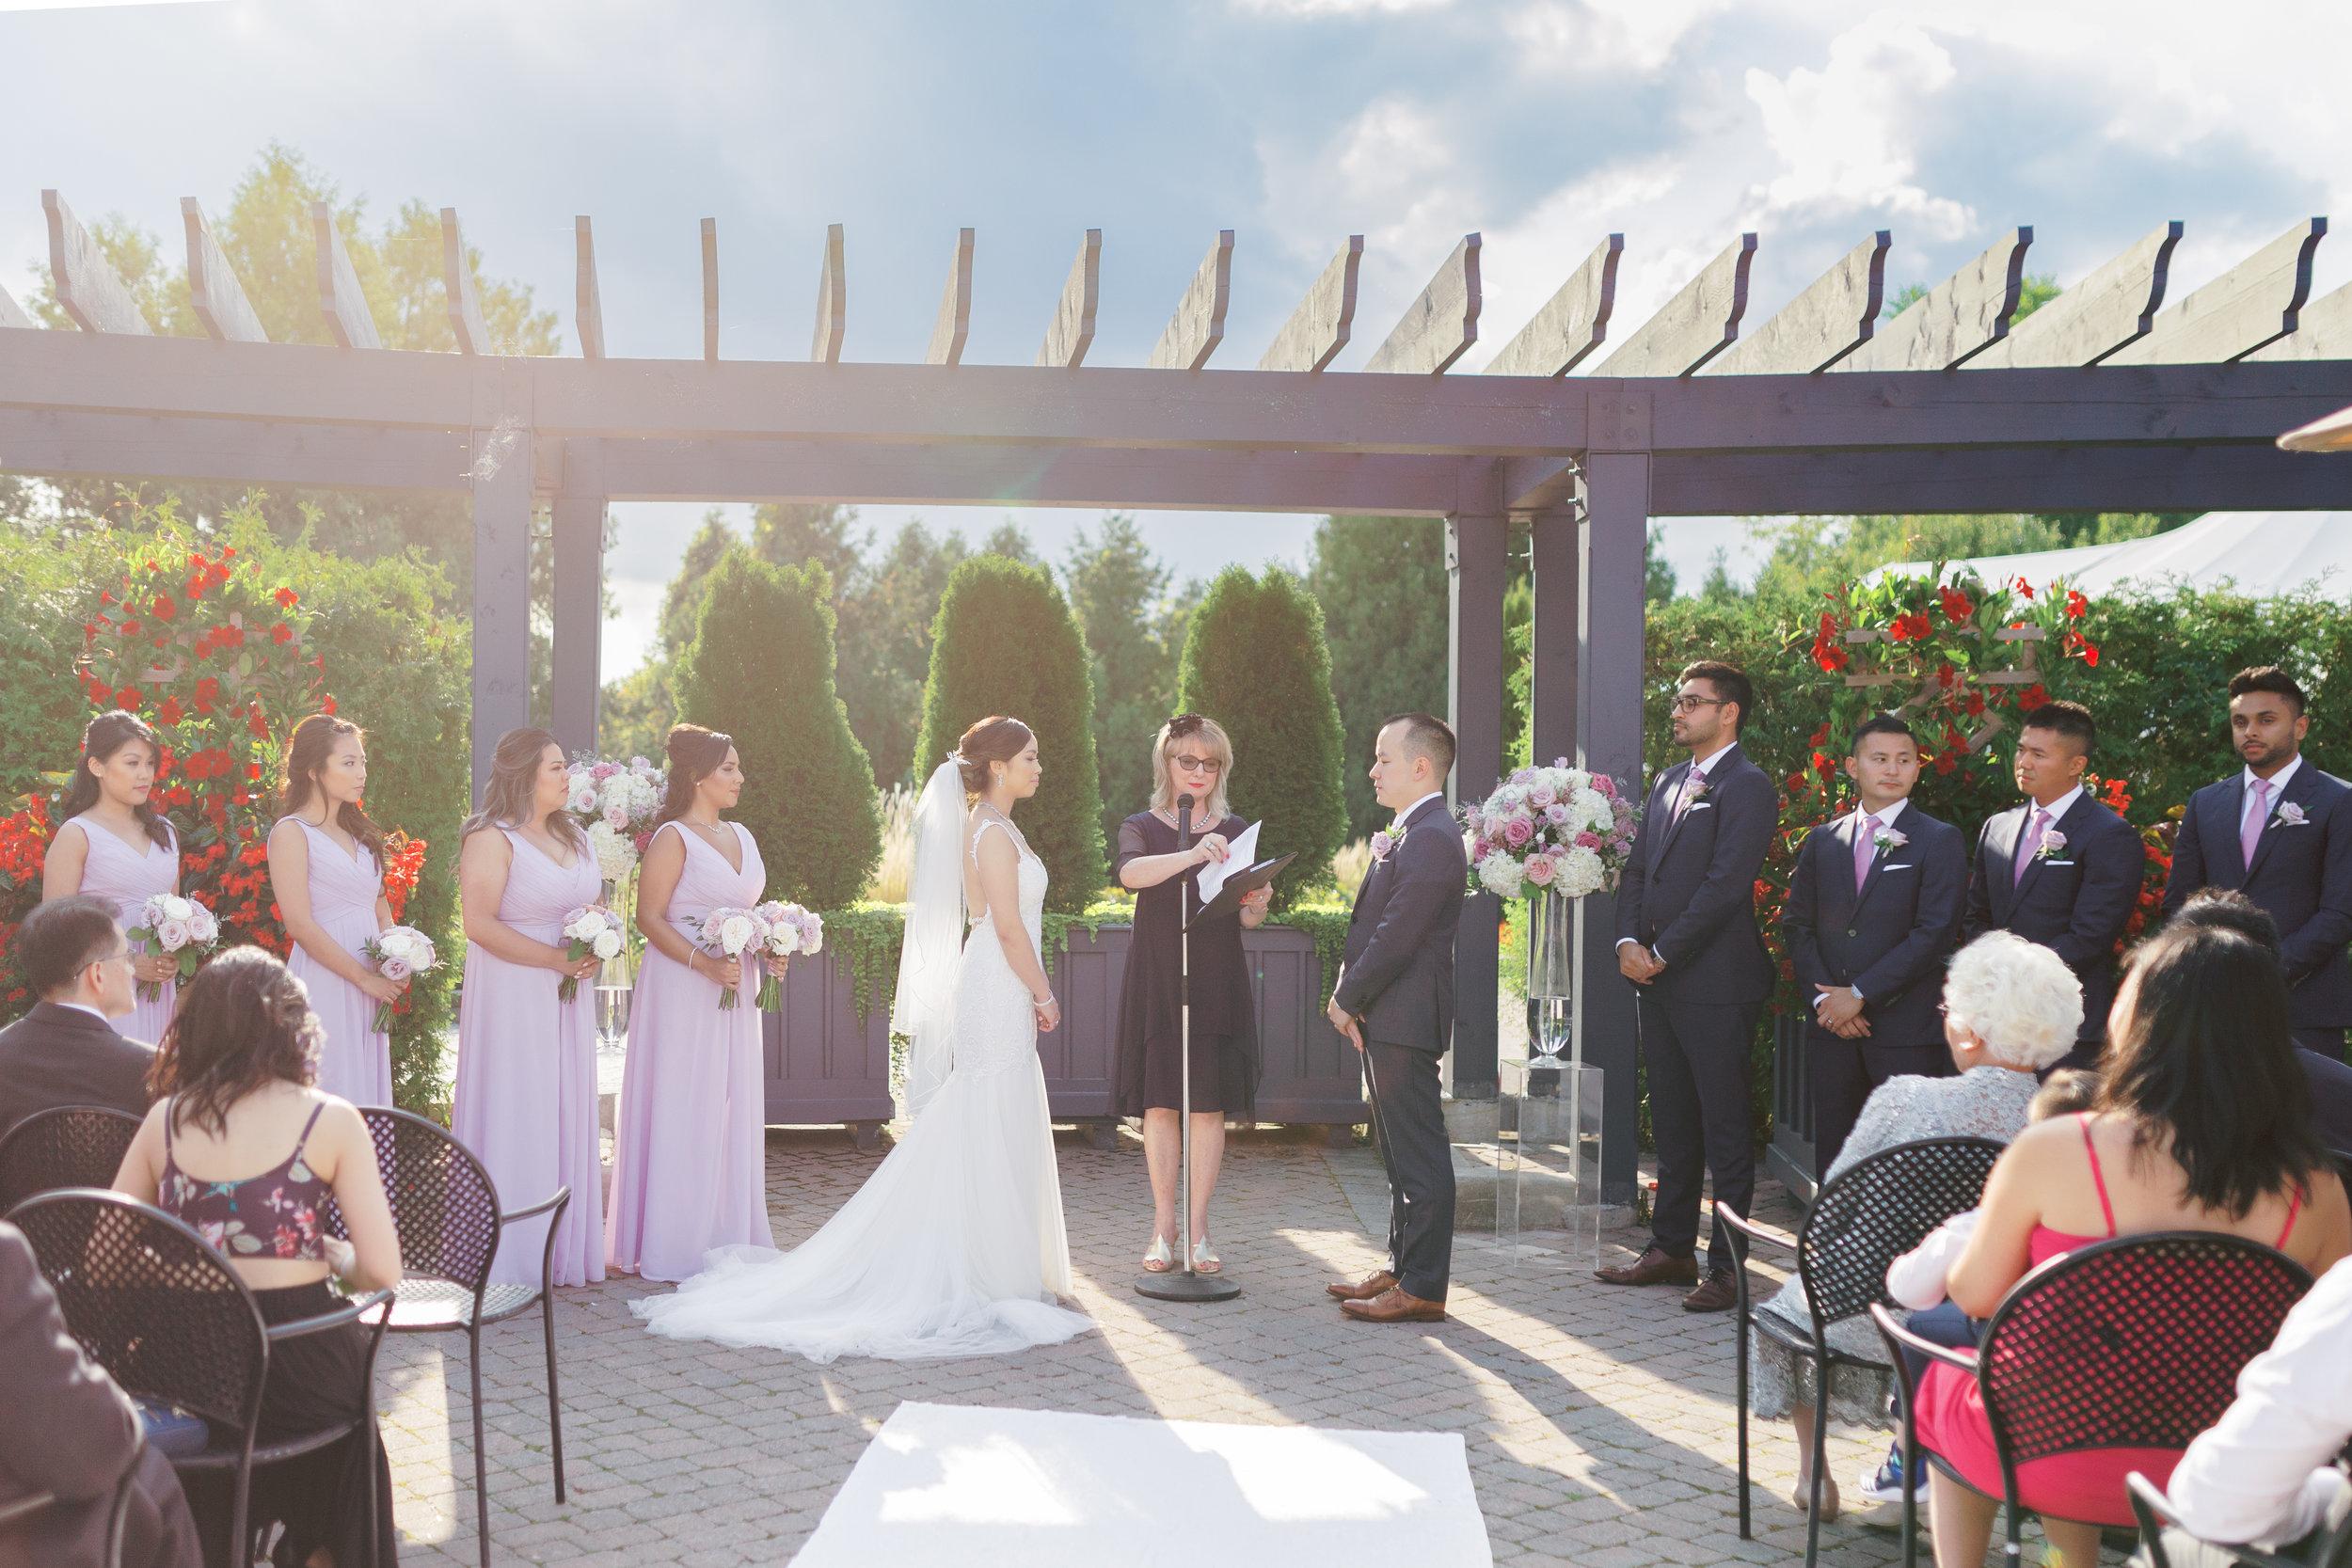 Angus Glen Wedding - Ceremony-44.jpg